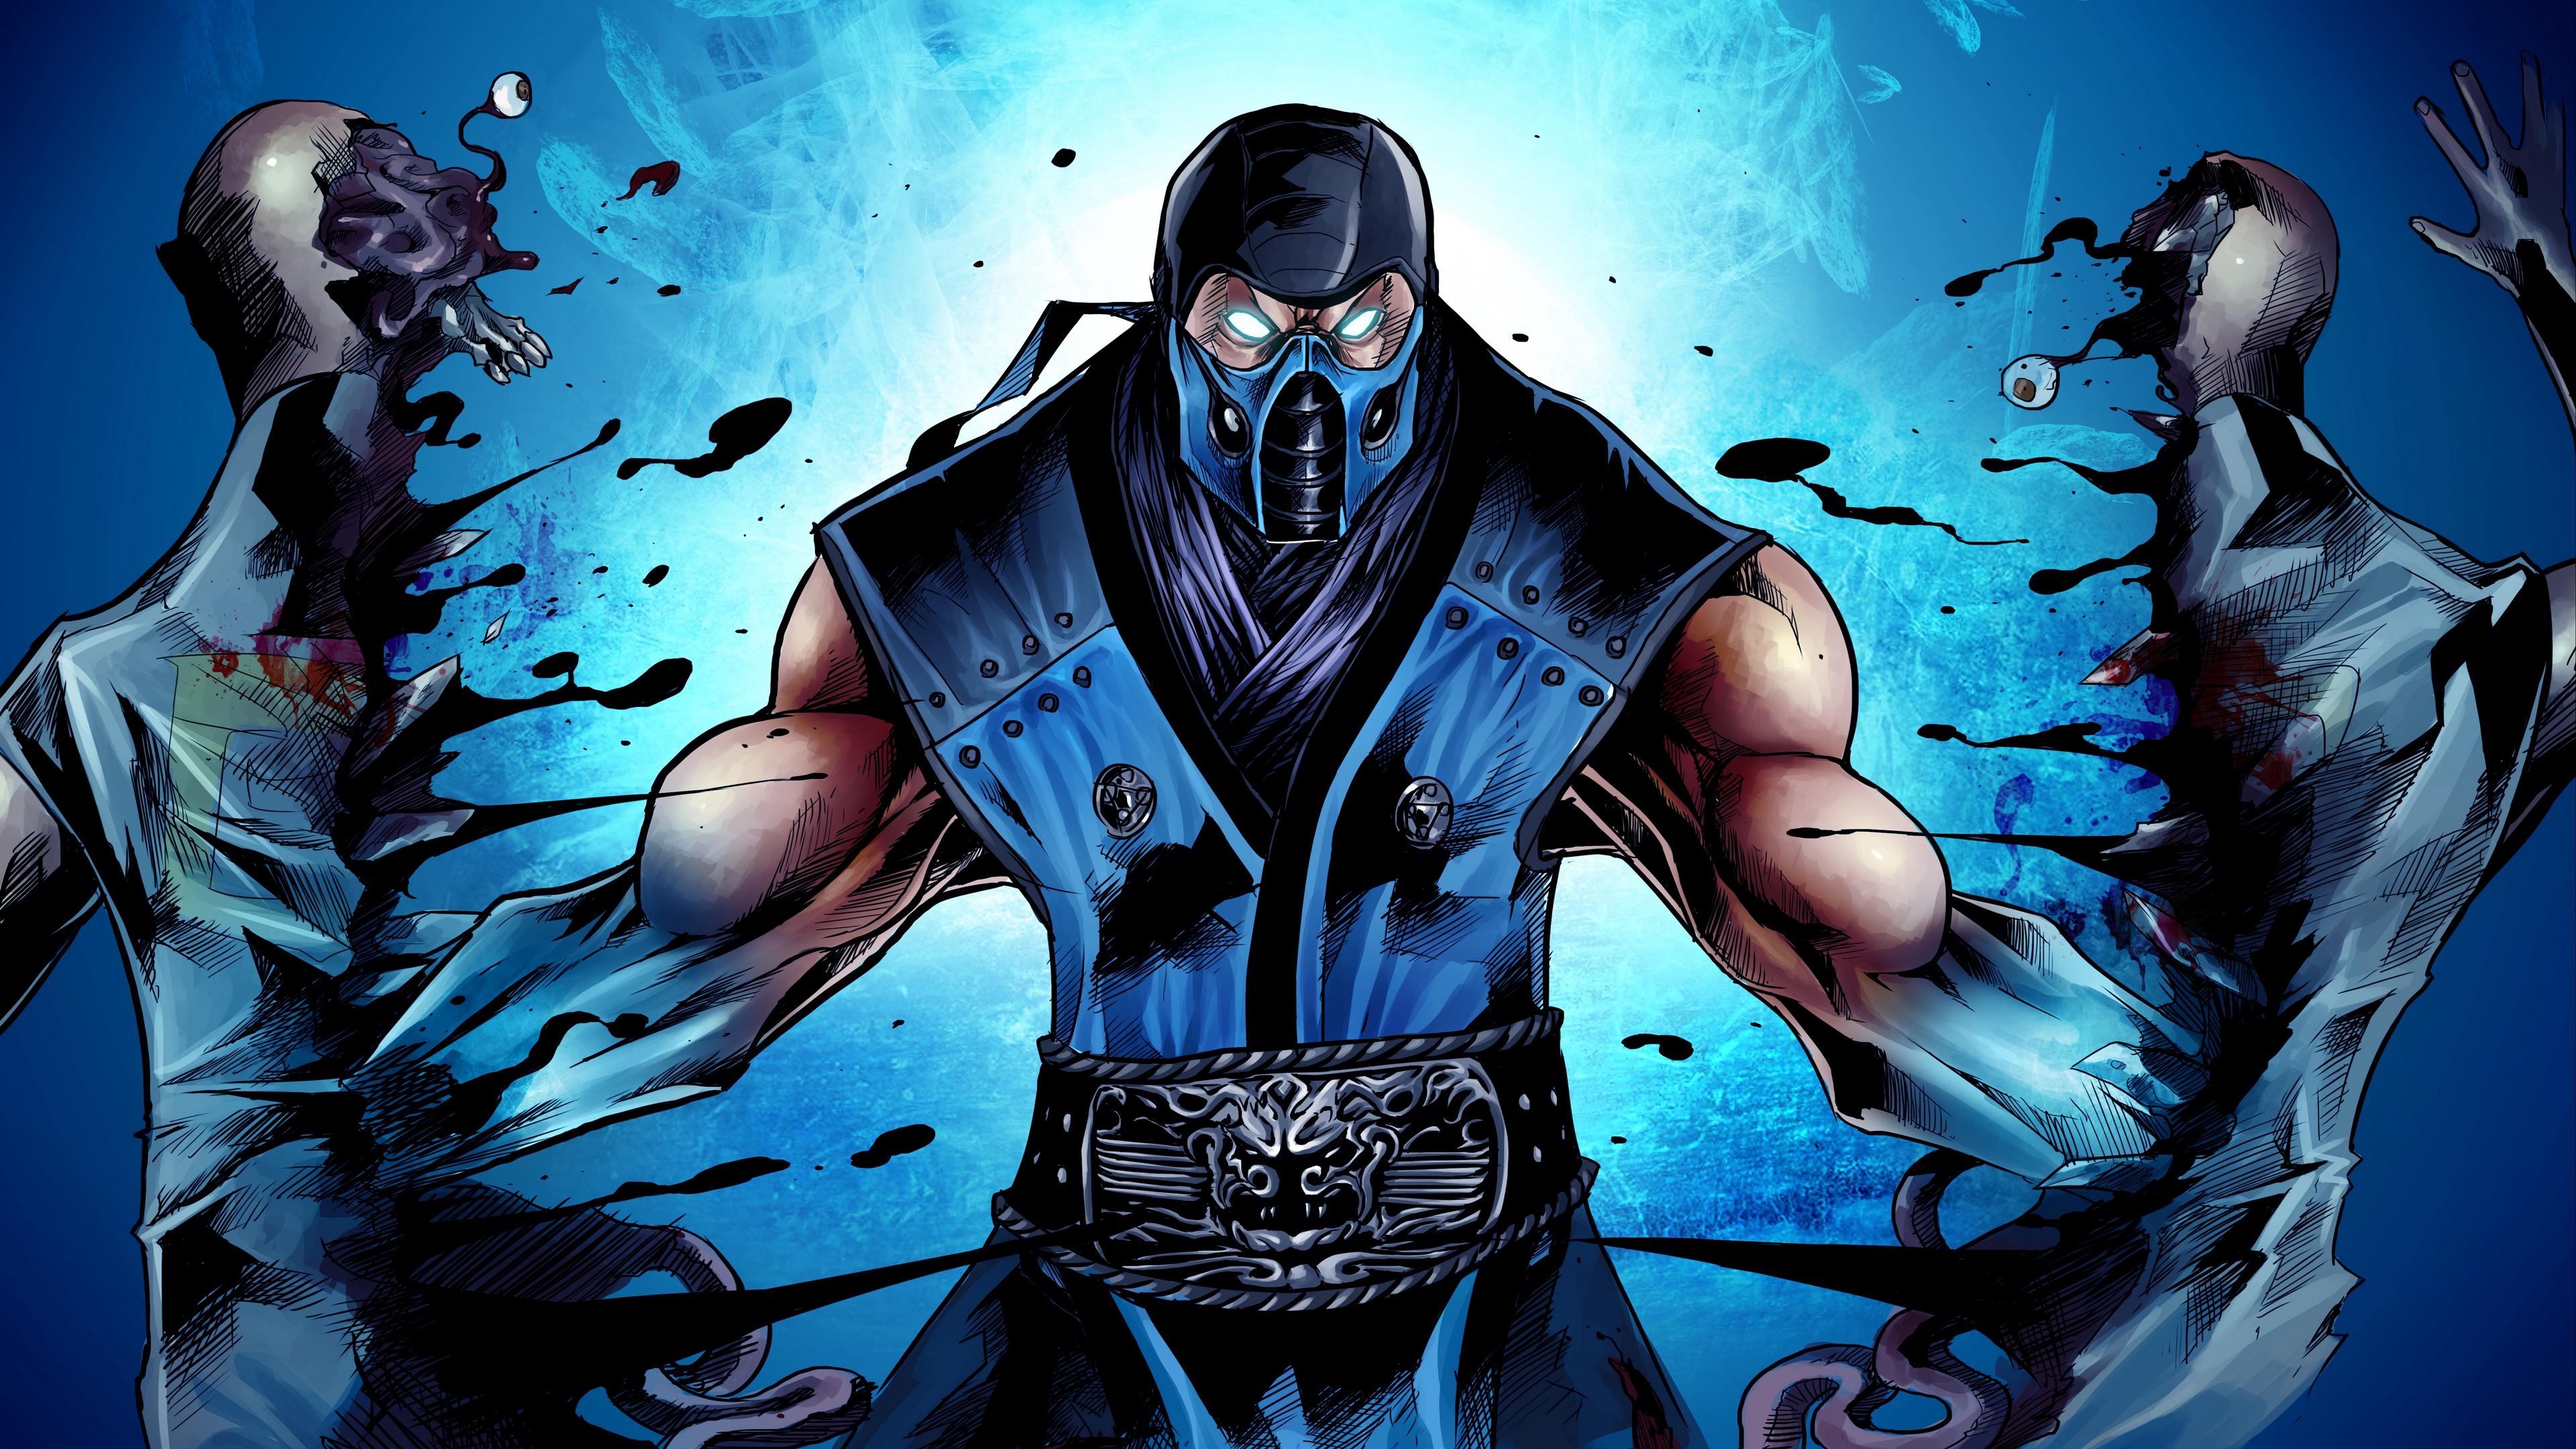 mortal kombat sub zero ninja art 4k 1538944918 - mortal kombat, sub-zero, ninja, art 4k - sub-zero, Ninja, mortal kombat